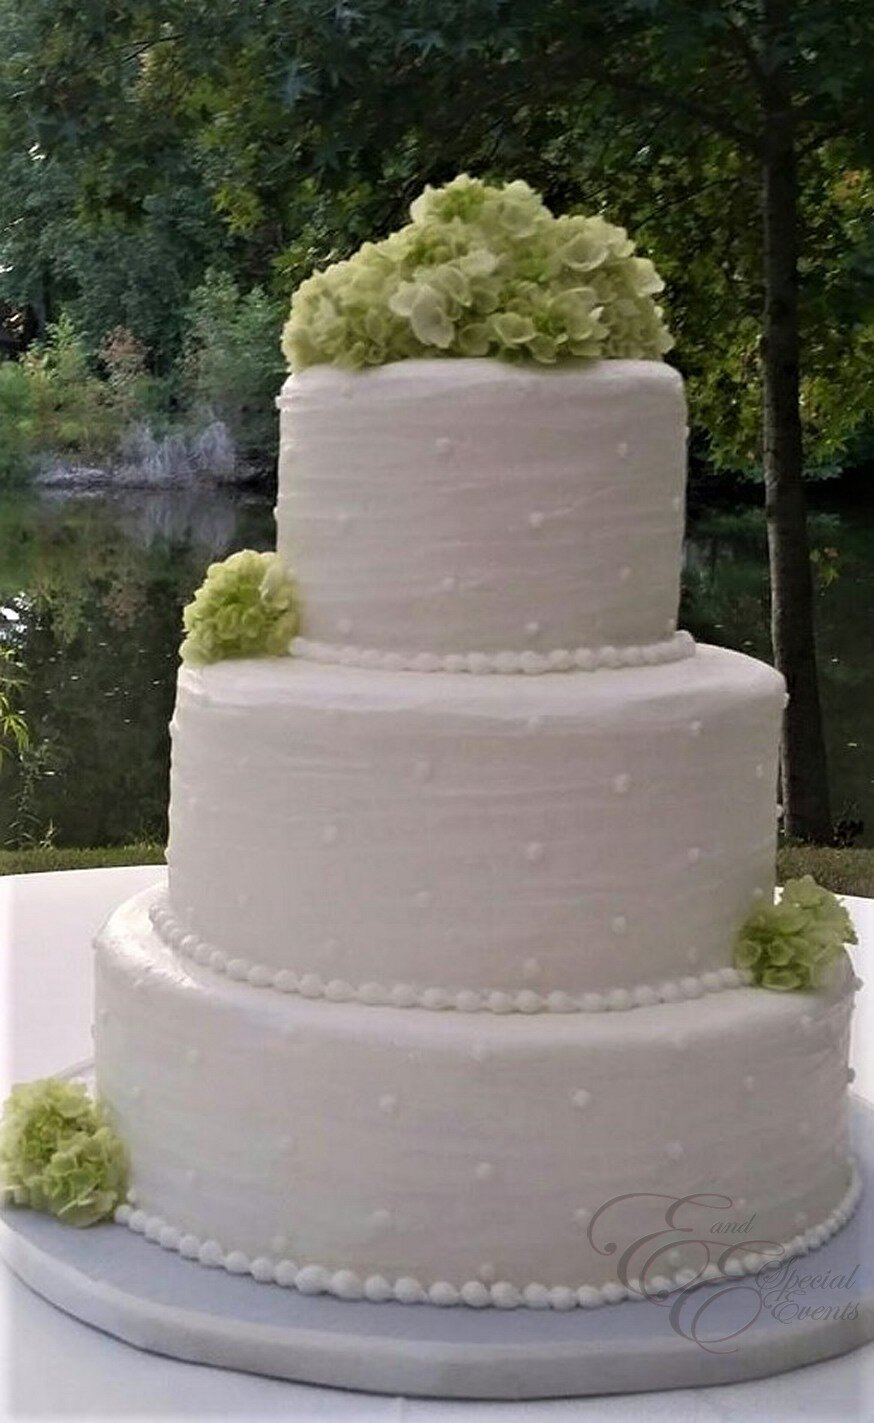 white wedding cake with green flowers.jpg